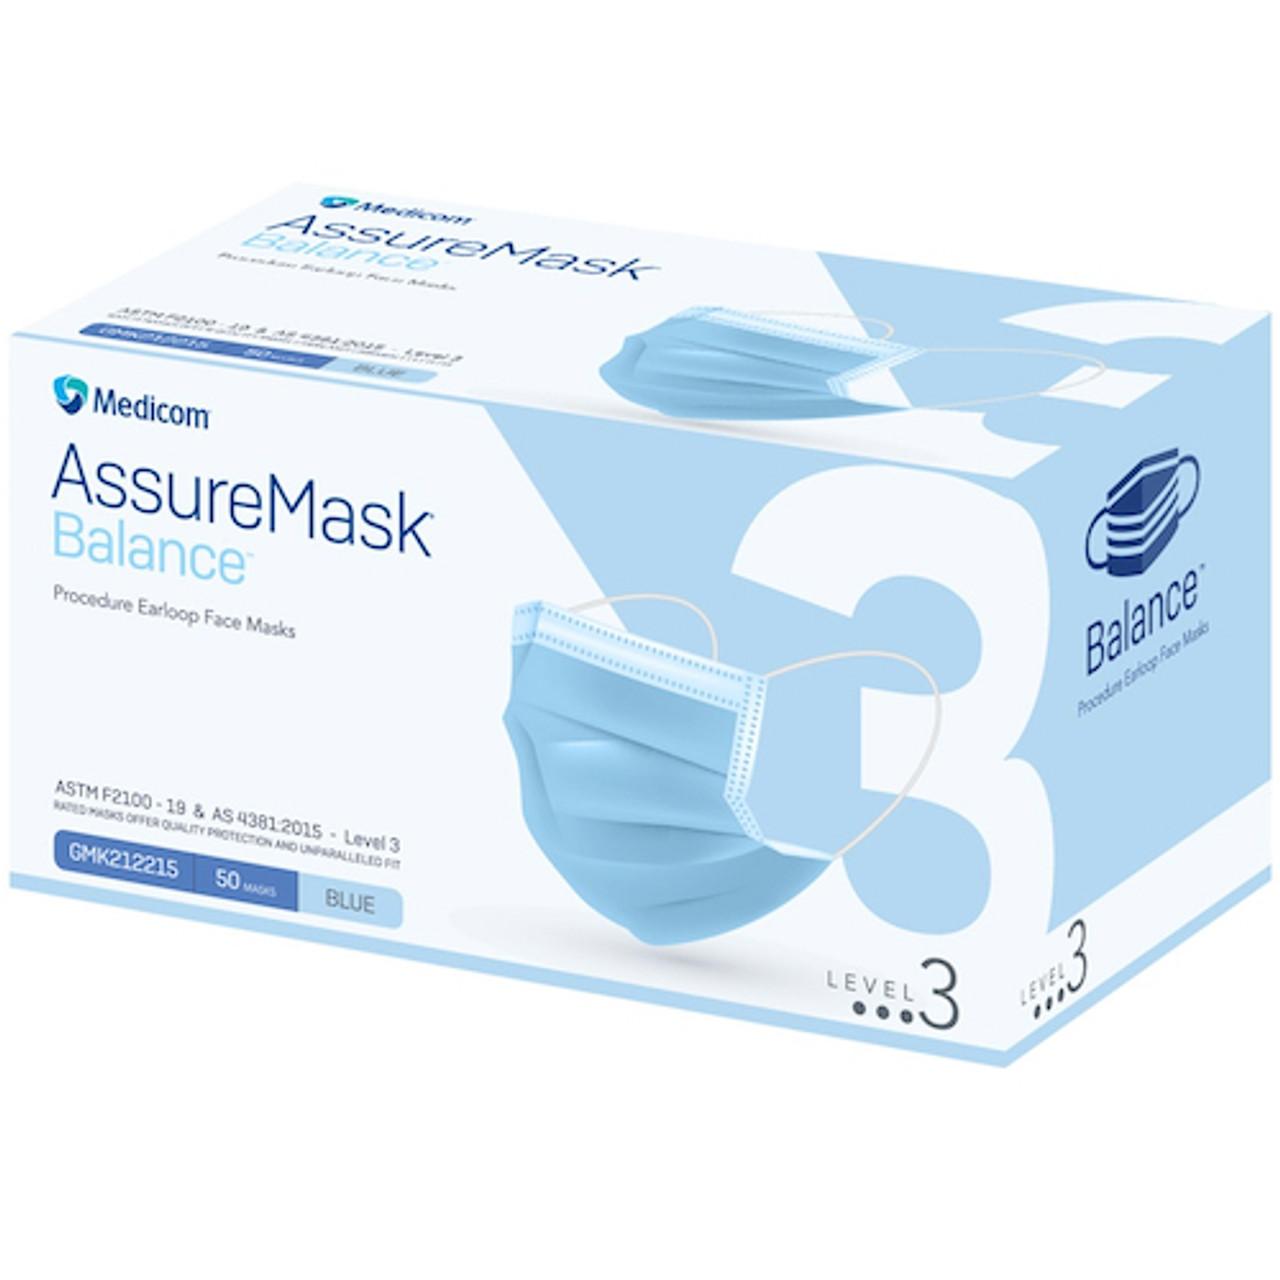 Medicom ASU Balance 3Ply Level 3 Earloop Face Mask Blue 50/box